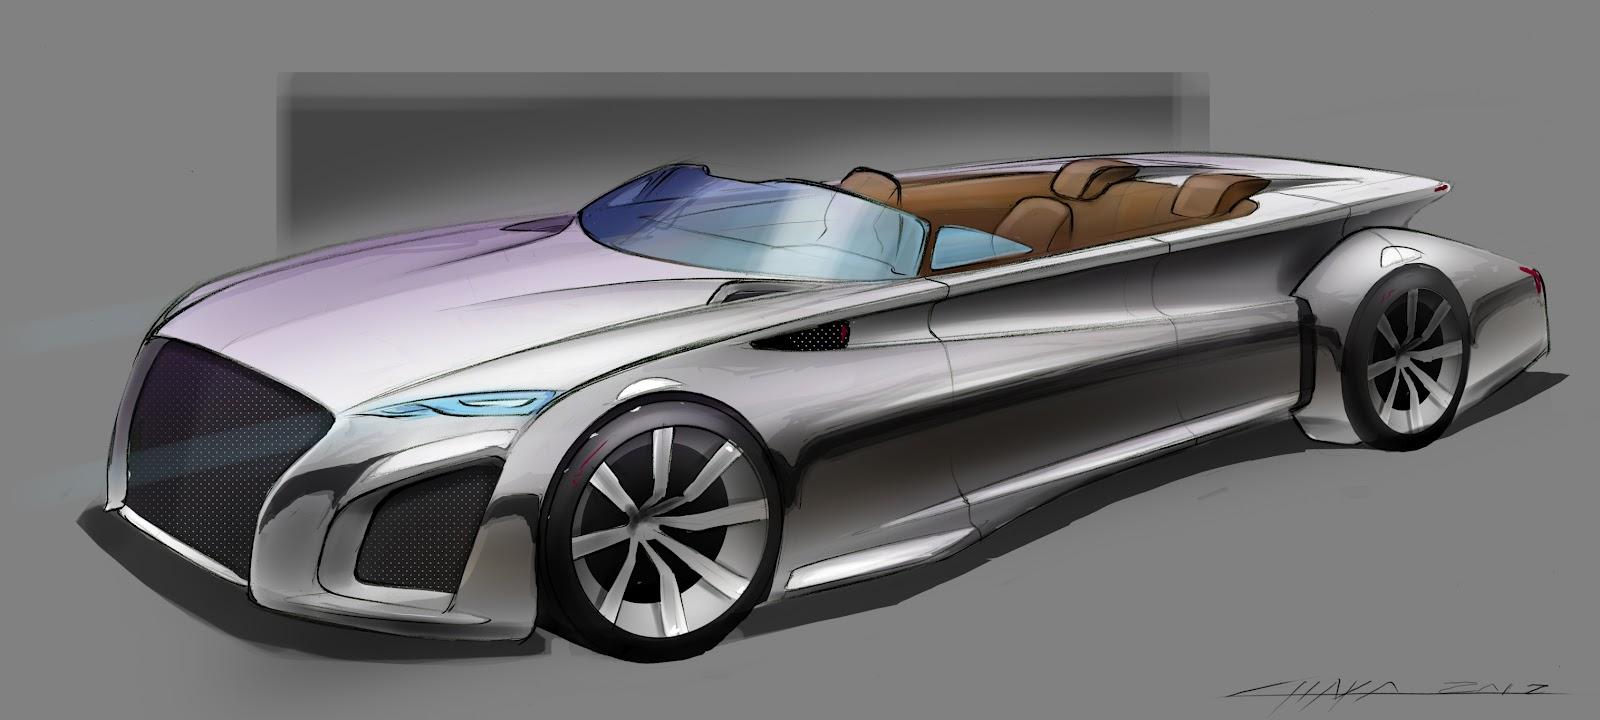 Chacko Abraham Super Luxury Cars